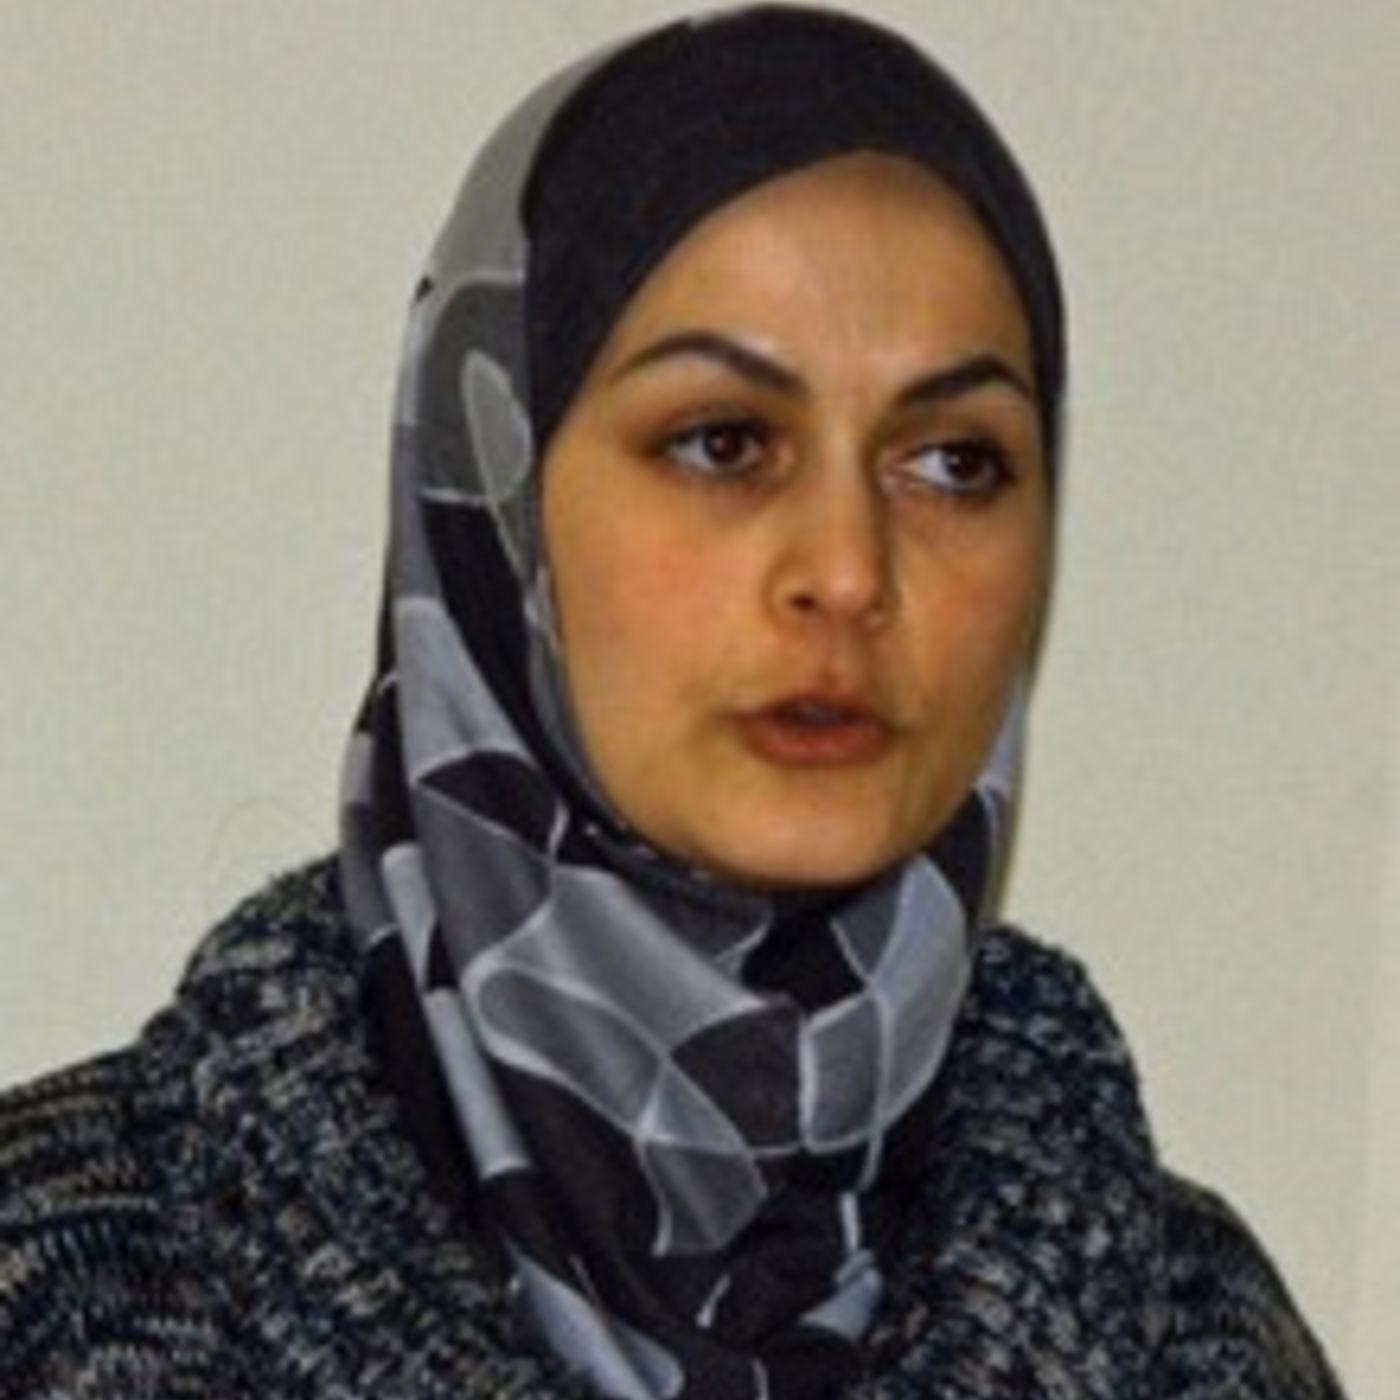 Gaza-Palestinian author and activist Laila El-Haddad recalls Operation Cast Lead